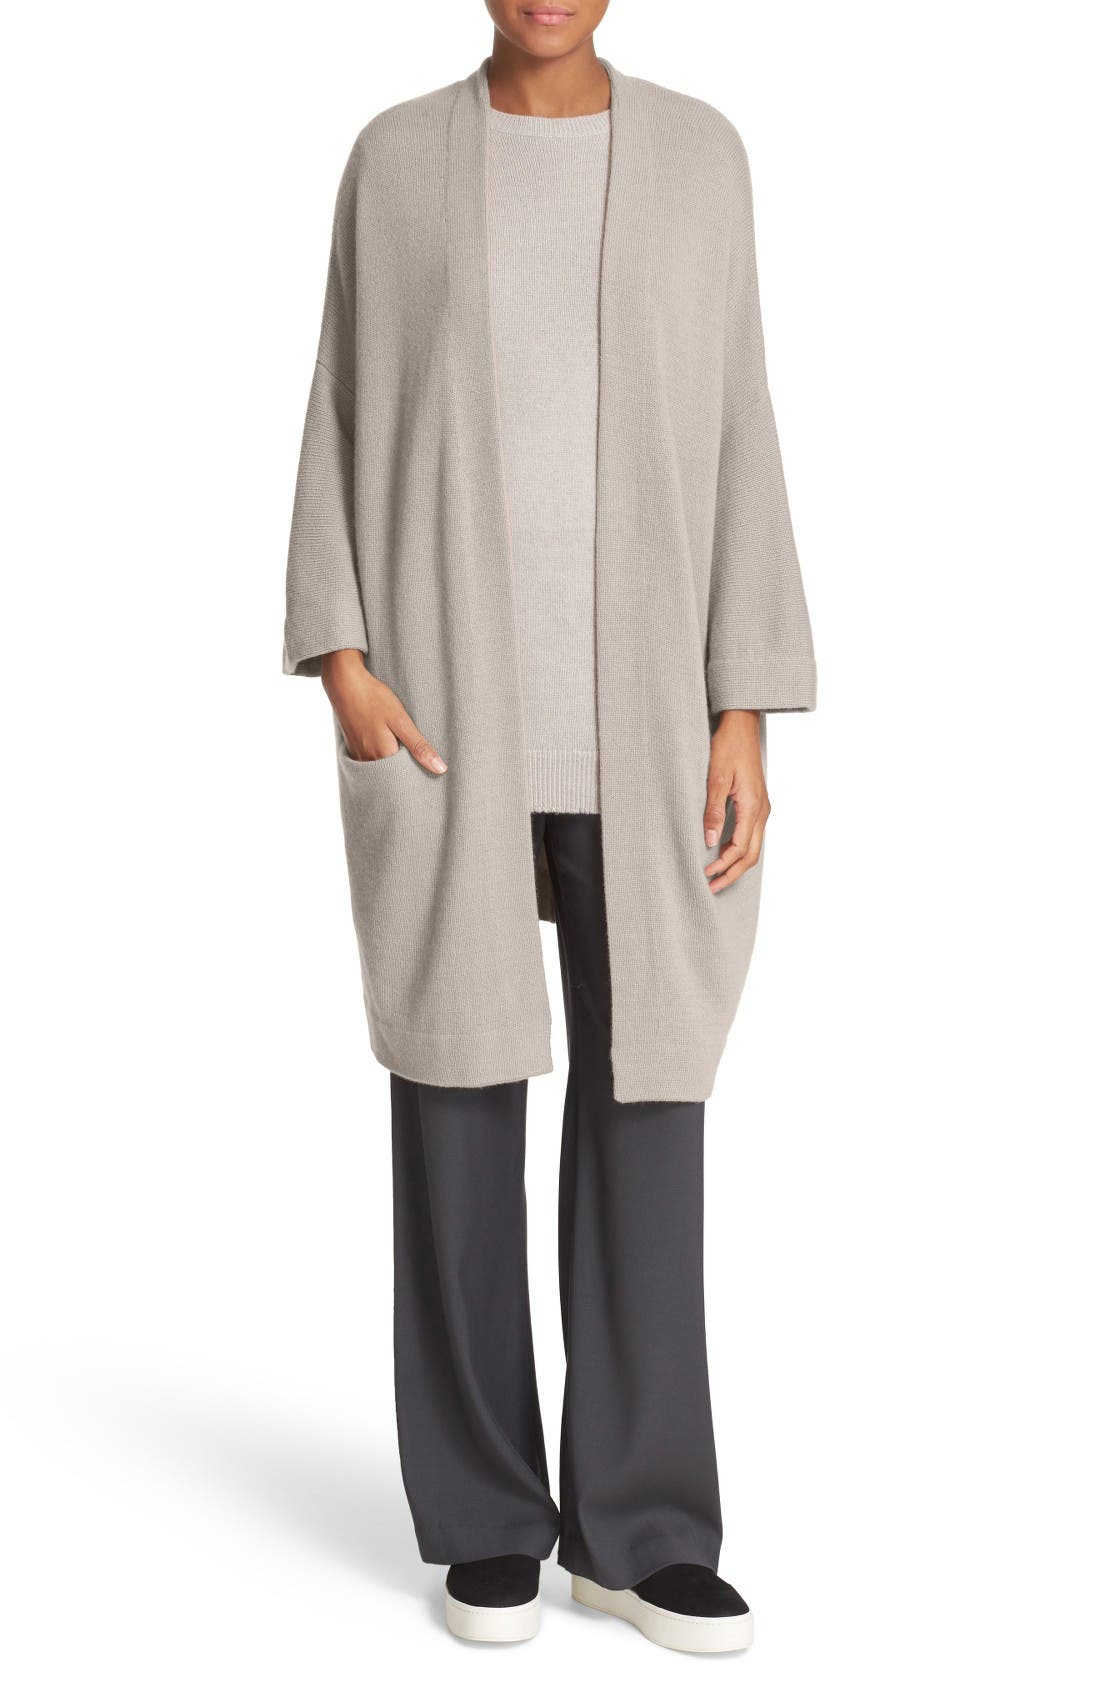 Alternate Image 1 Selected - Vince Open Front Cashmere Knit Coat